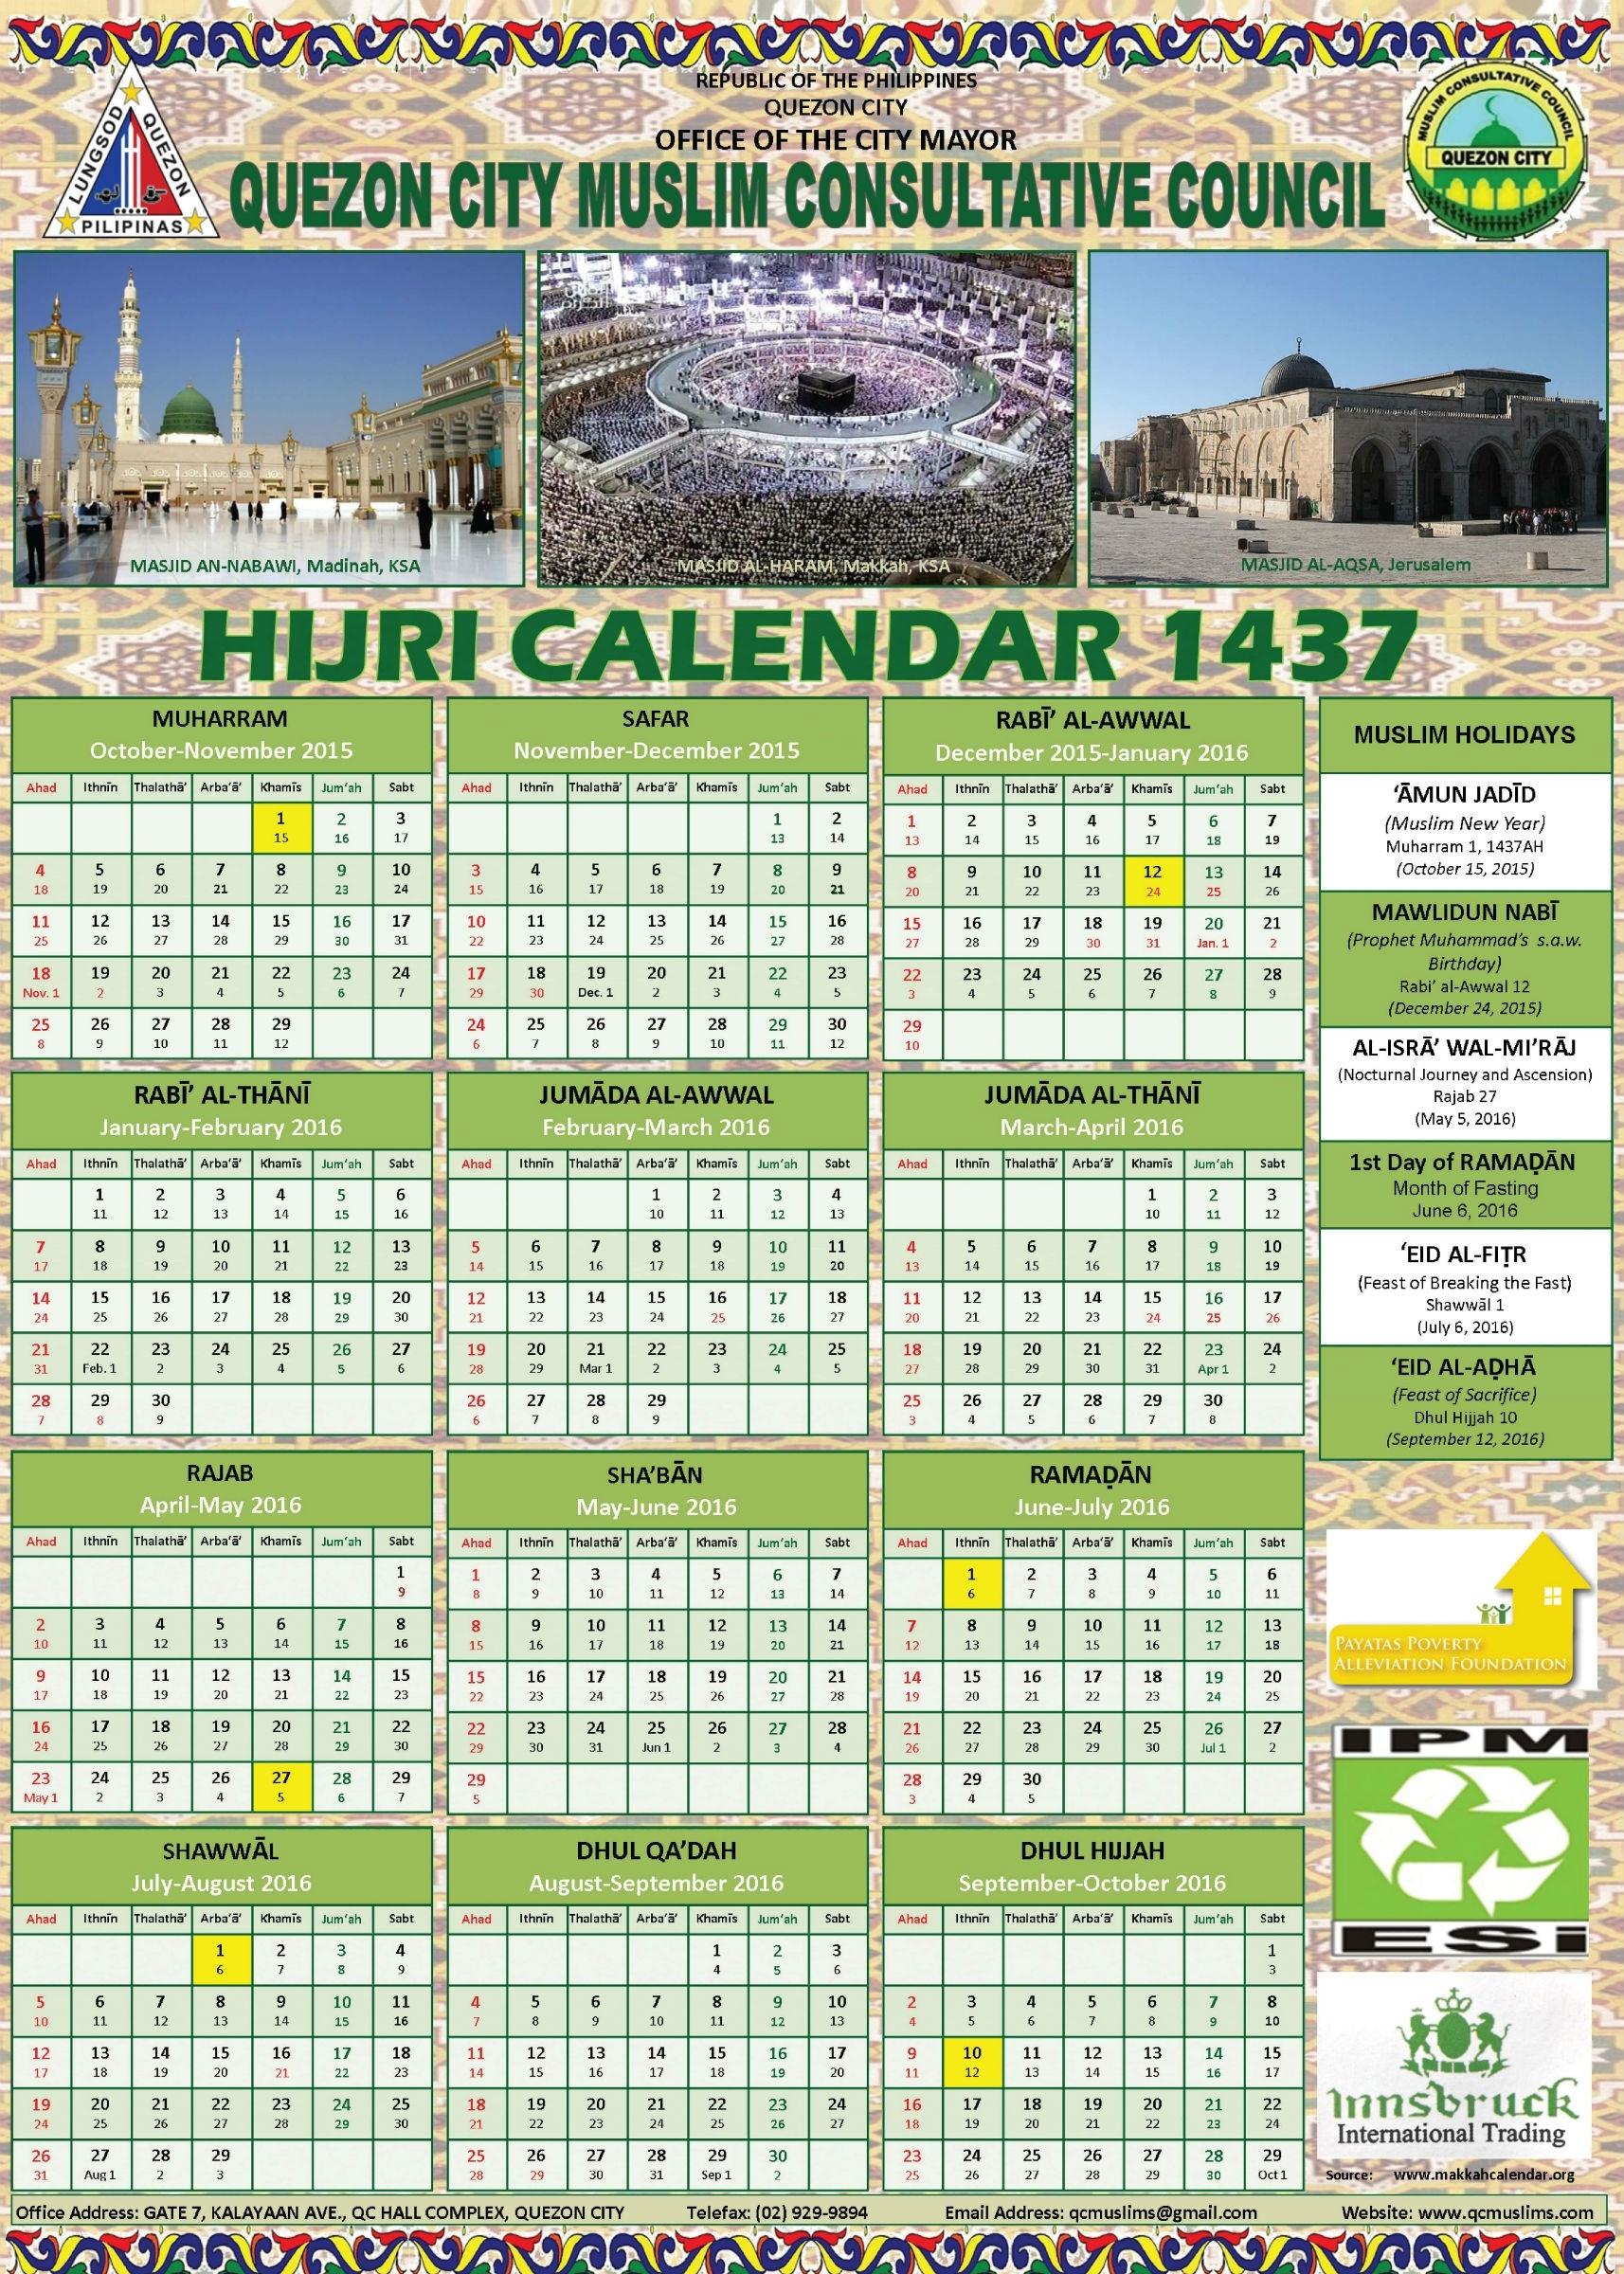 Official Hijri 1437 Calendar Ksa | Calendar Template 2019 regarding Islamic Calender In Saudi Arabia